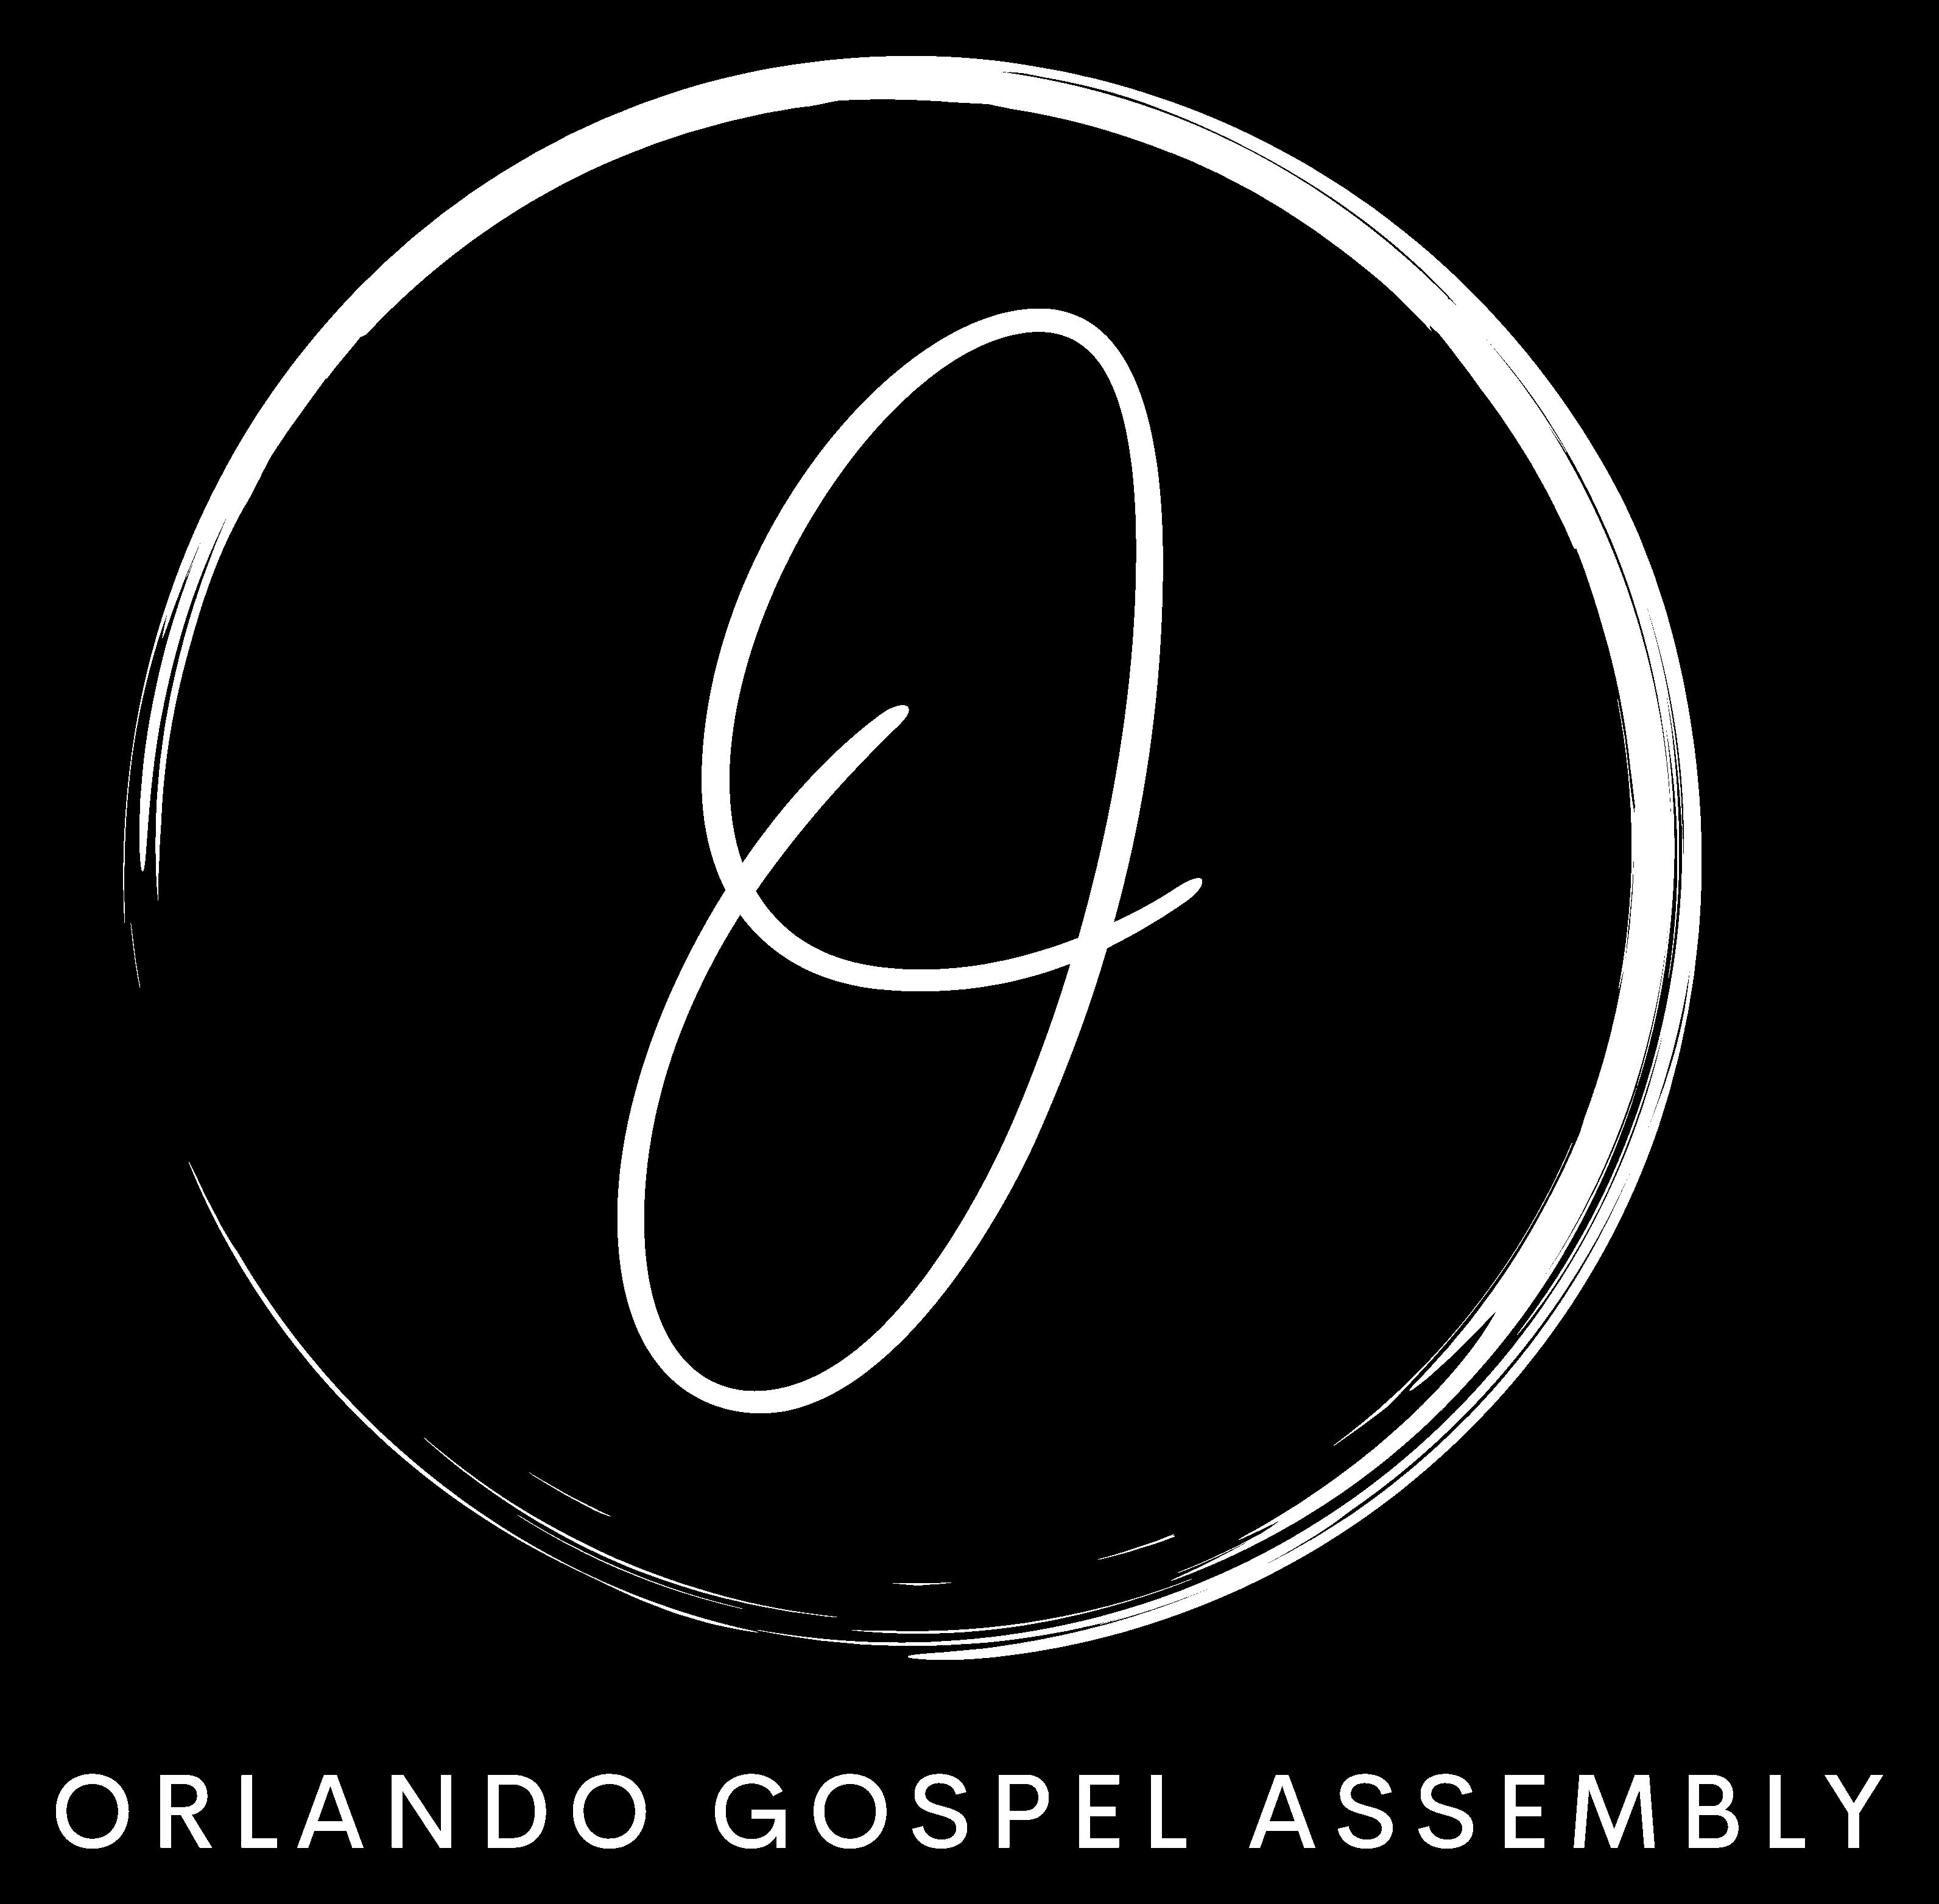 Orlando Gospel Assembly